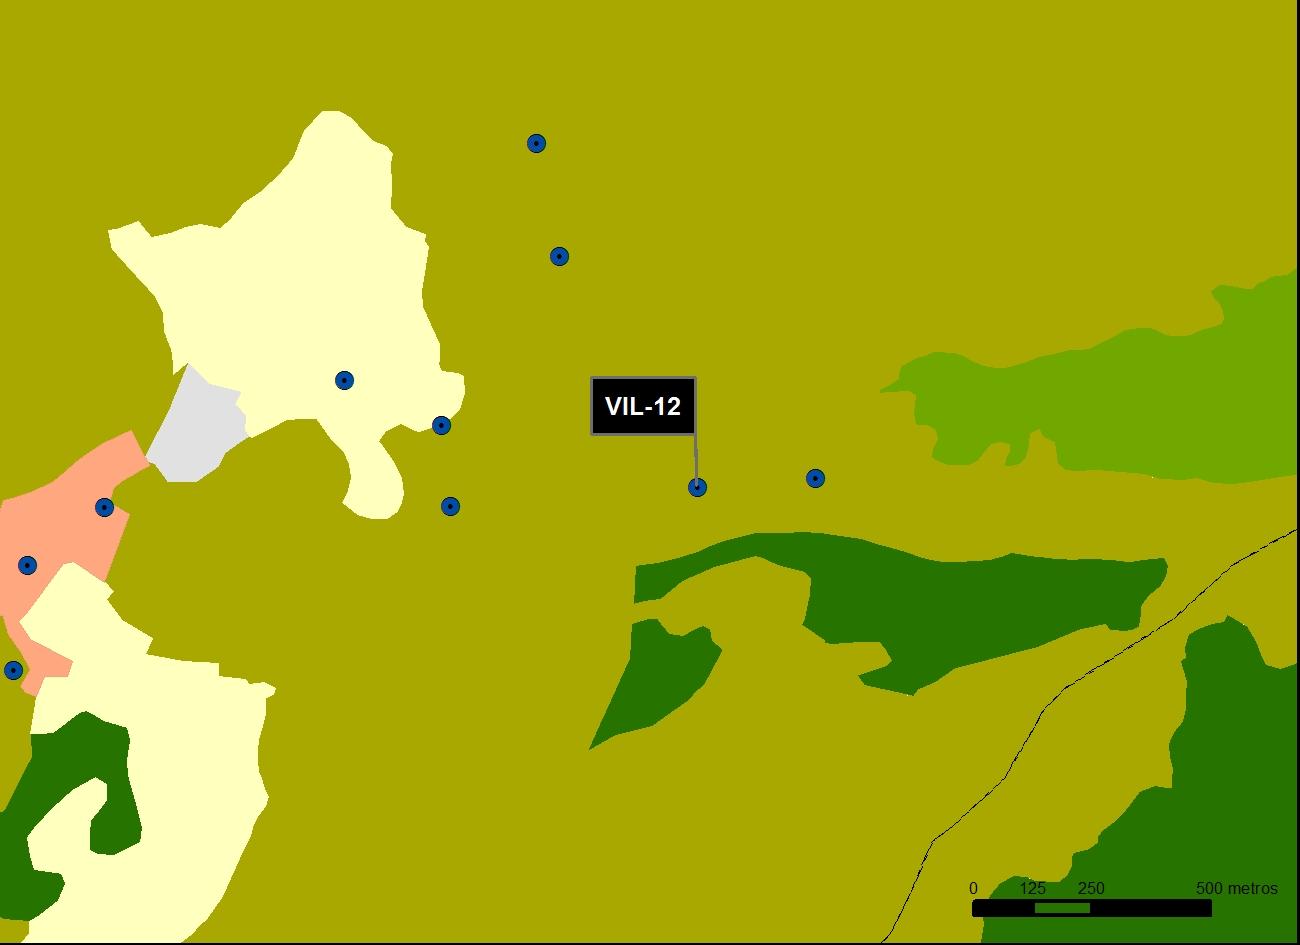 VIL_12_M.V.LOZANO_FÁBRICA_MAP.VEG